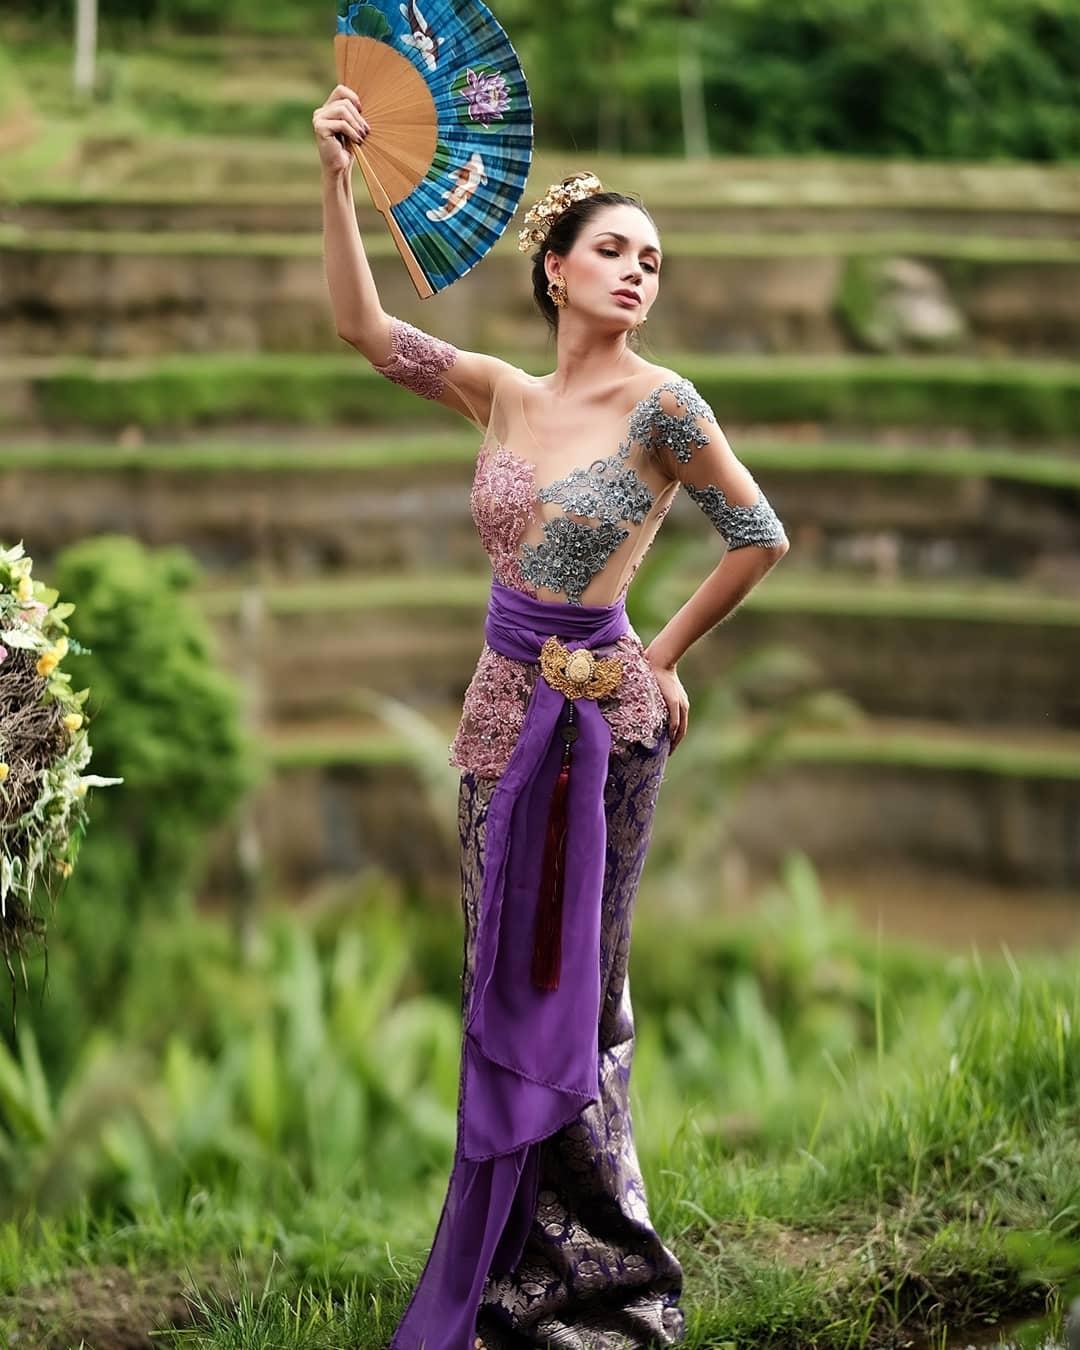 hany portocarrero, 1st runner-up de miss global 2019. - Página 2 89475510